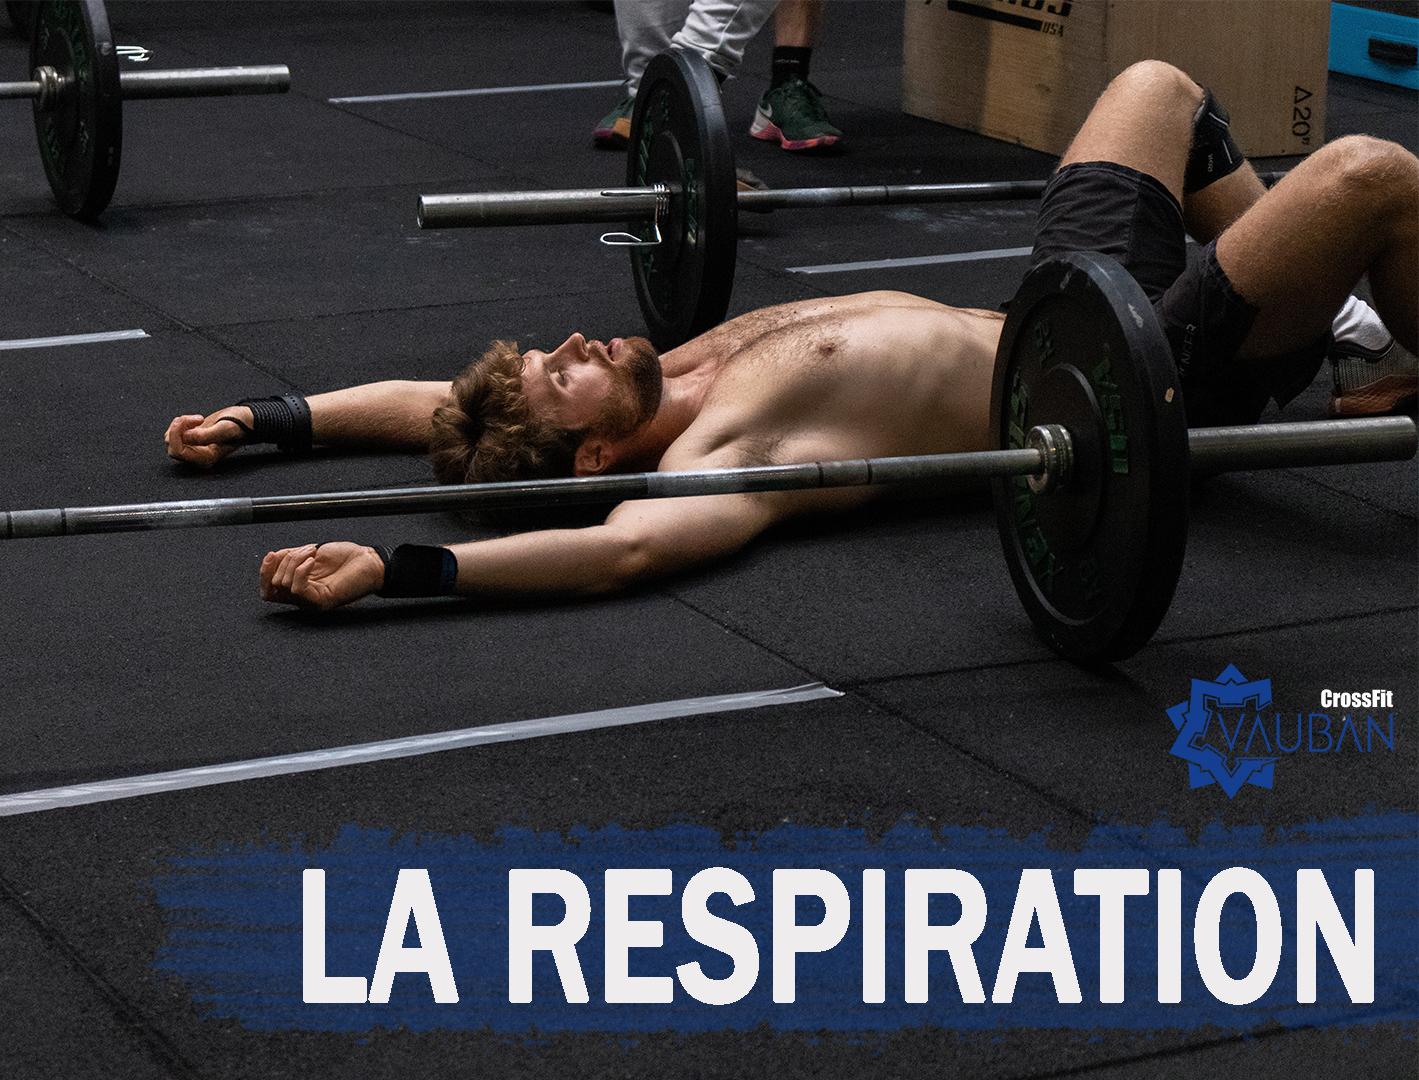 La Respiration CrossFit Vauban Lille